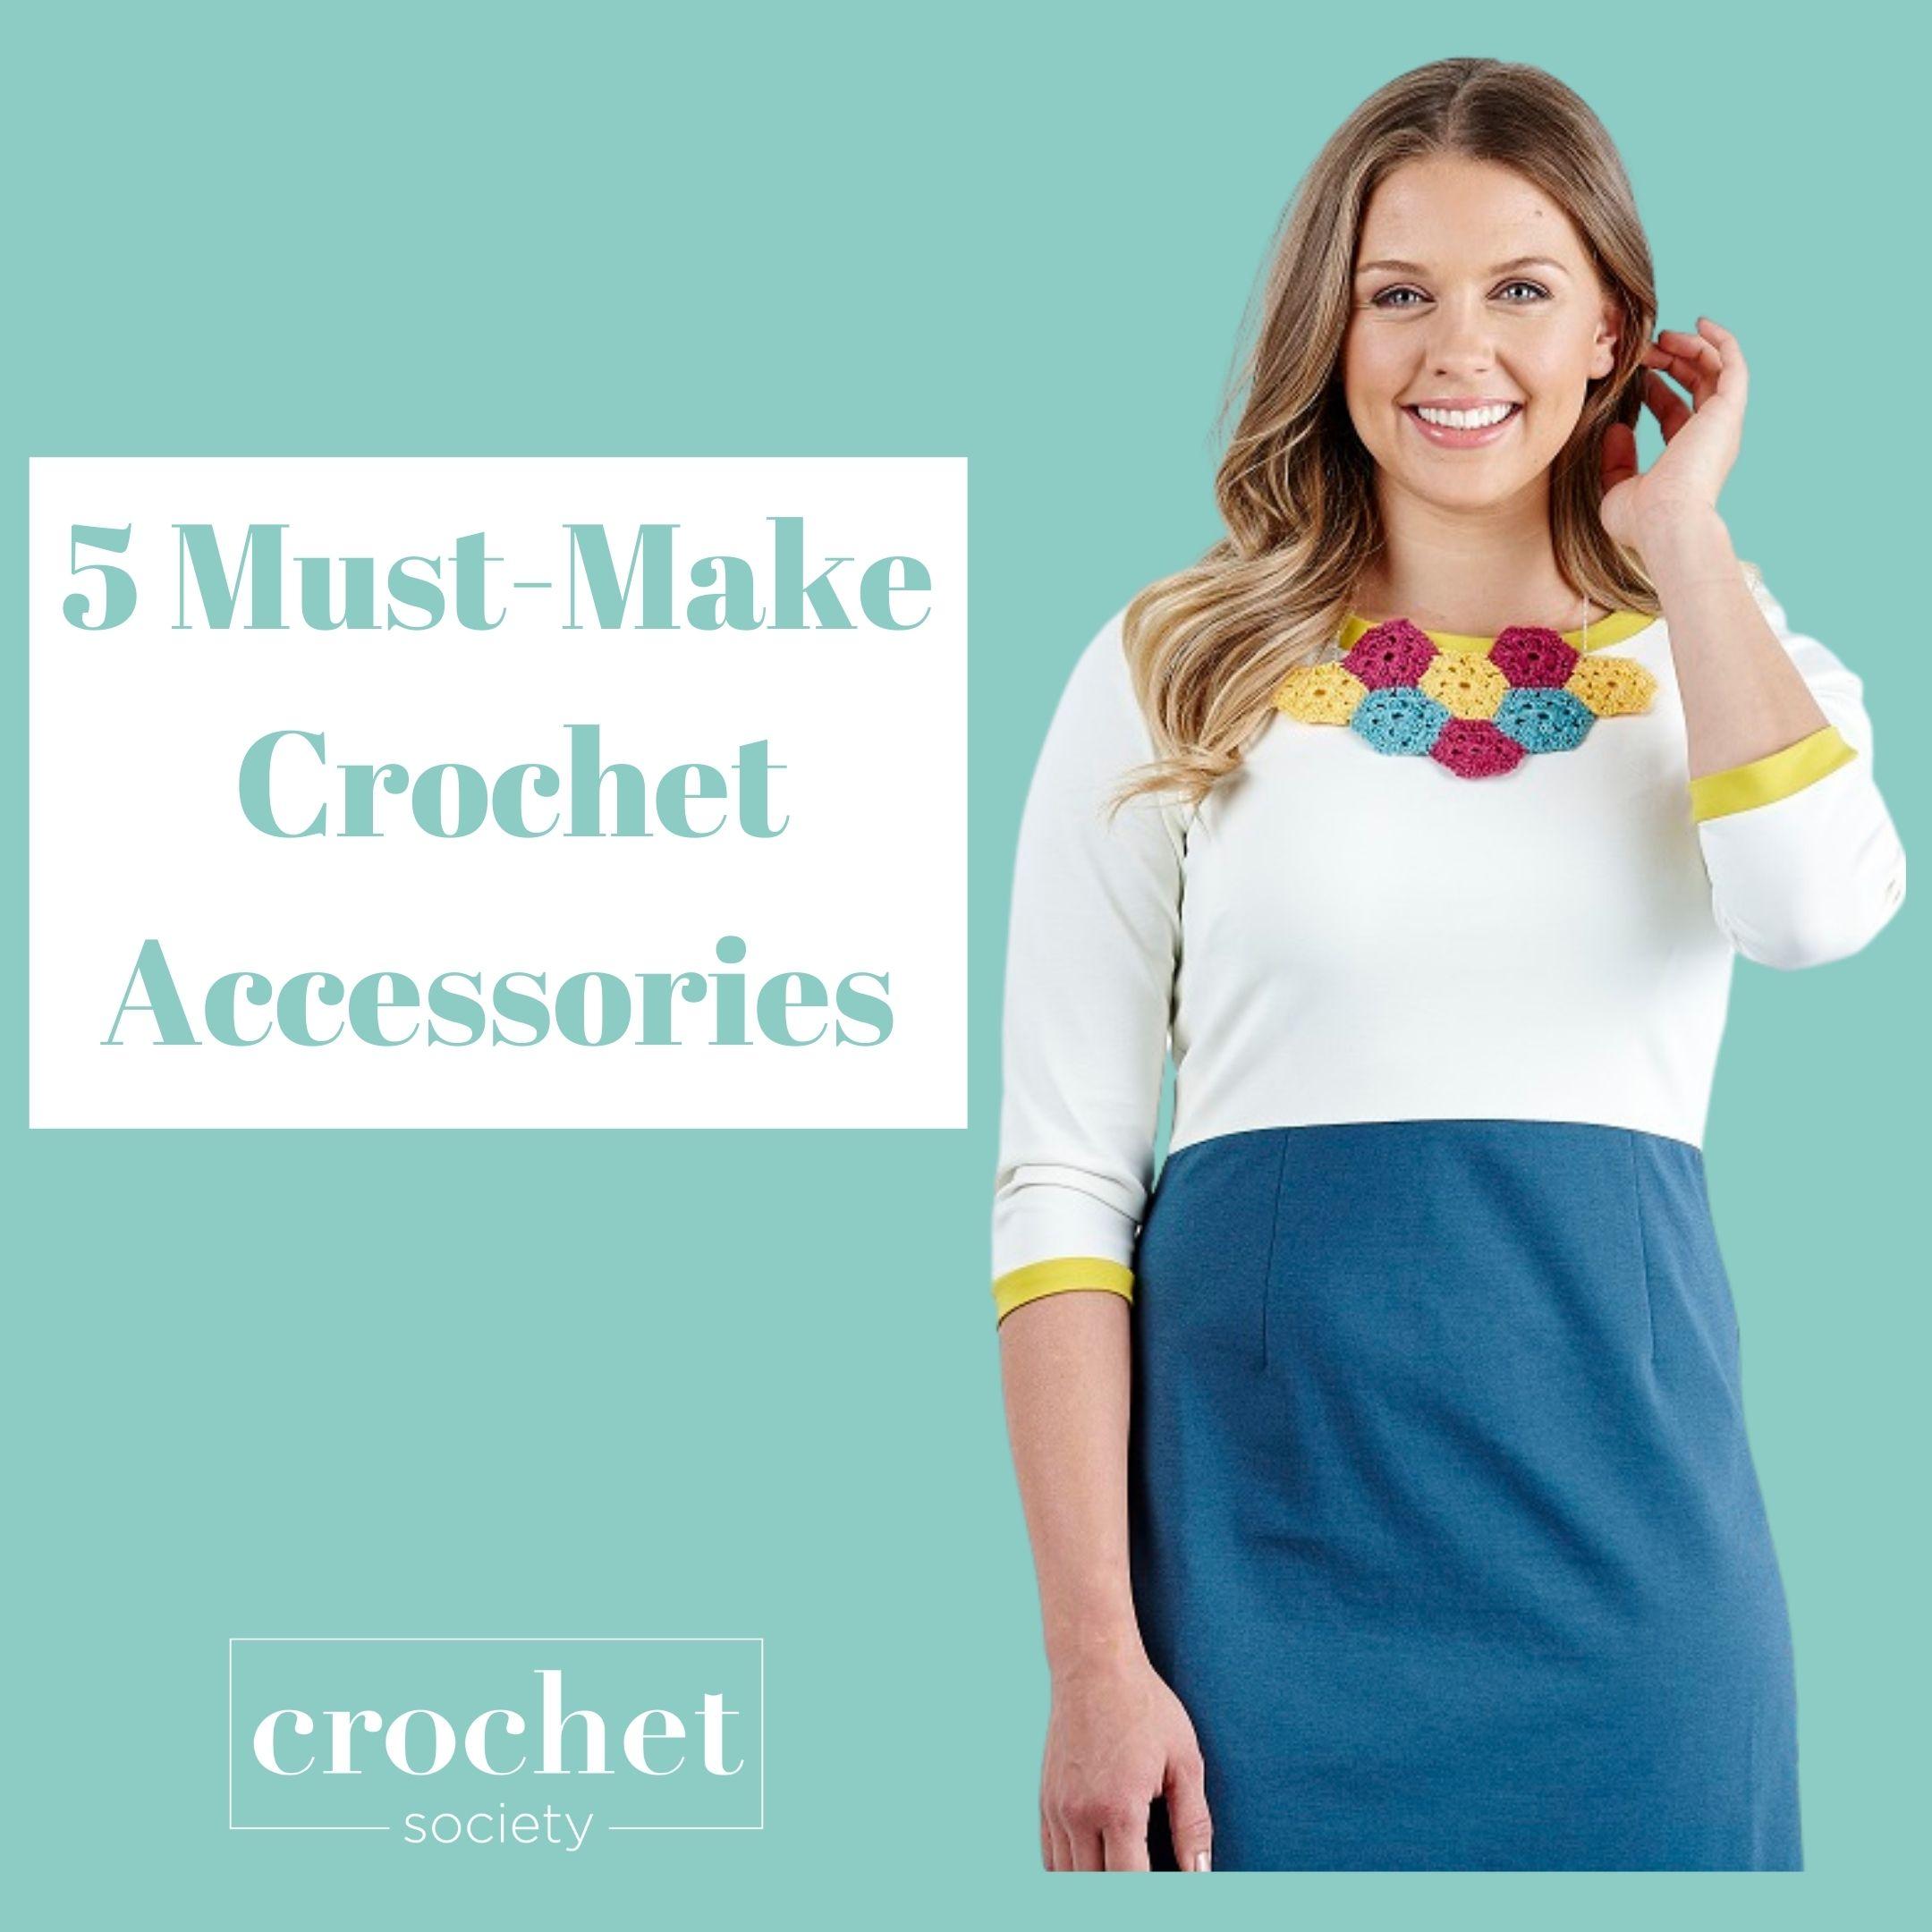 5 must make crochet accessories